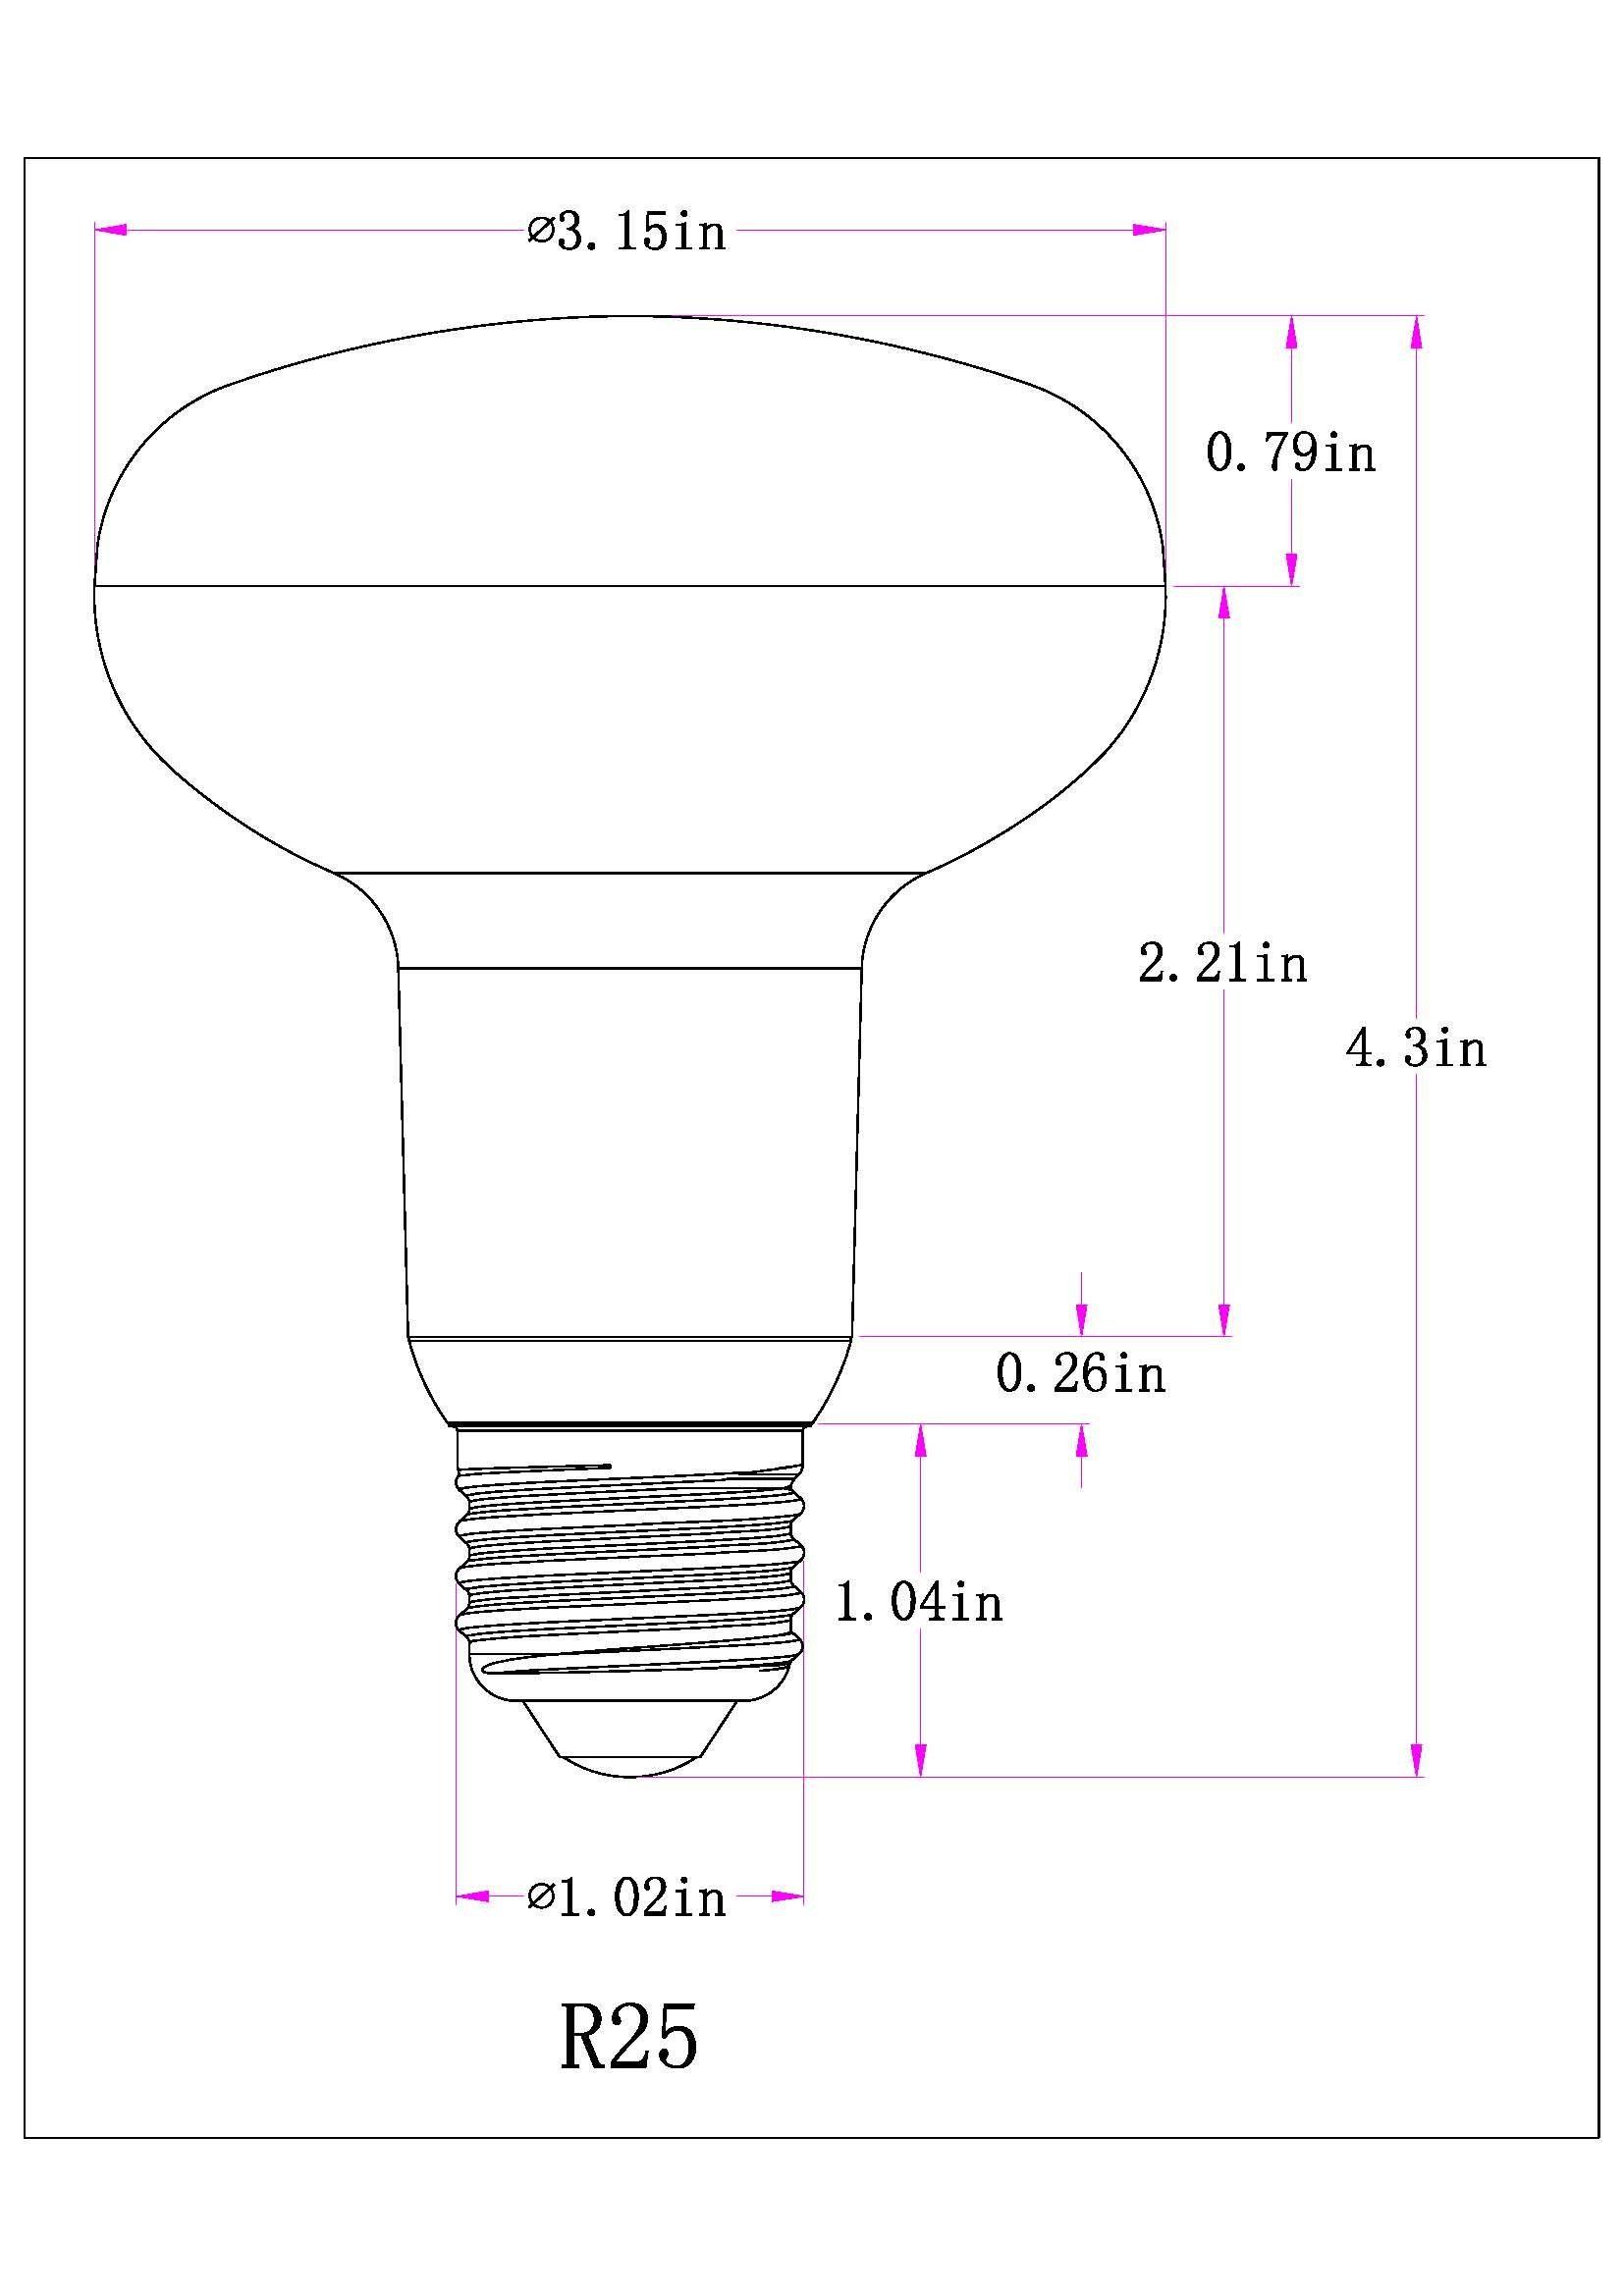 medium resolution of 1 pack 12w r25 dimmable led flood light bulbs e26 medium base 100w incandescent bulbs equivalent high lumens 1200lmwarm white 2700k led recessed lighting